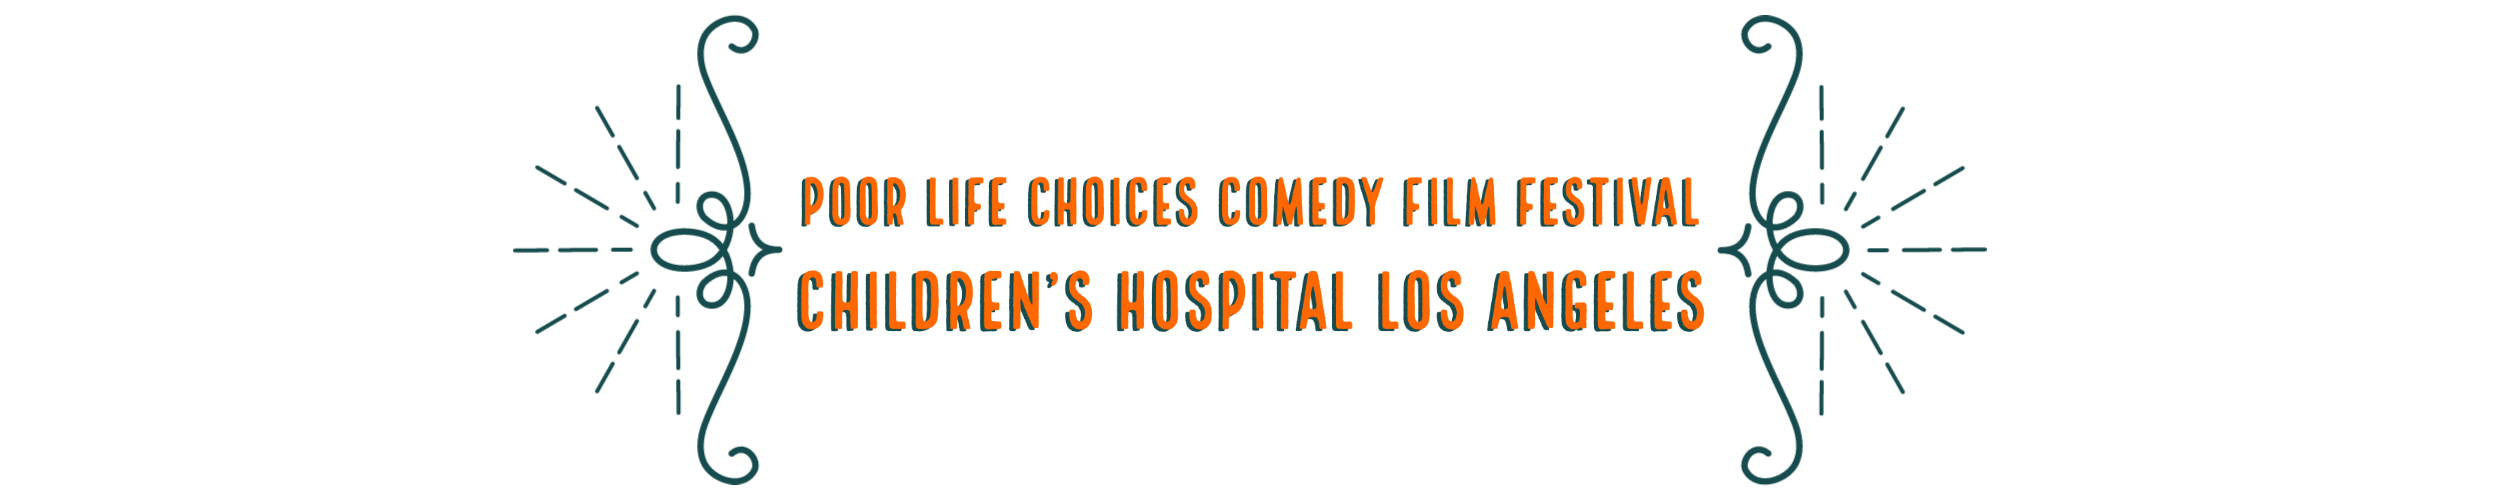 CHILDREN S HOSPITAL LOS ANGELES Copy